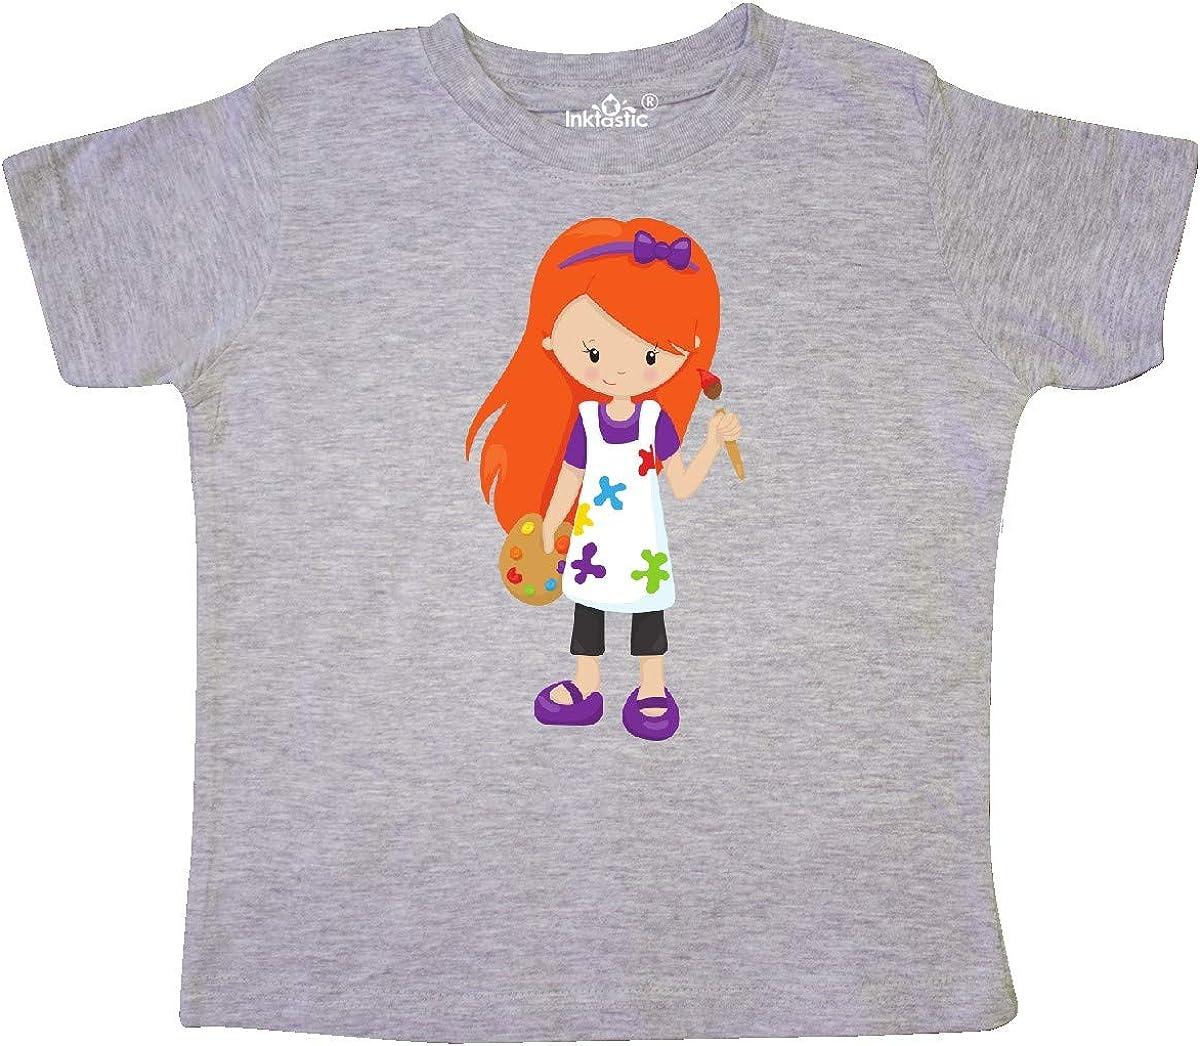 Painter Orange Hair Paint Artist Toddler T-Shirt inktastic Cute Girl